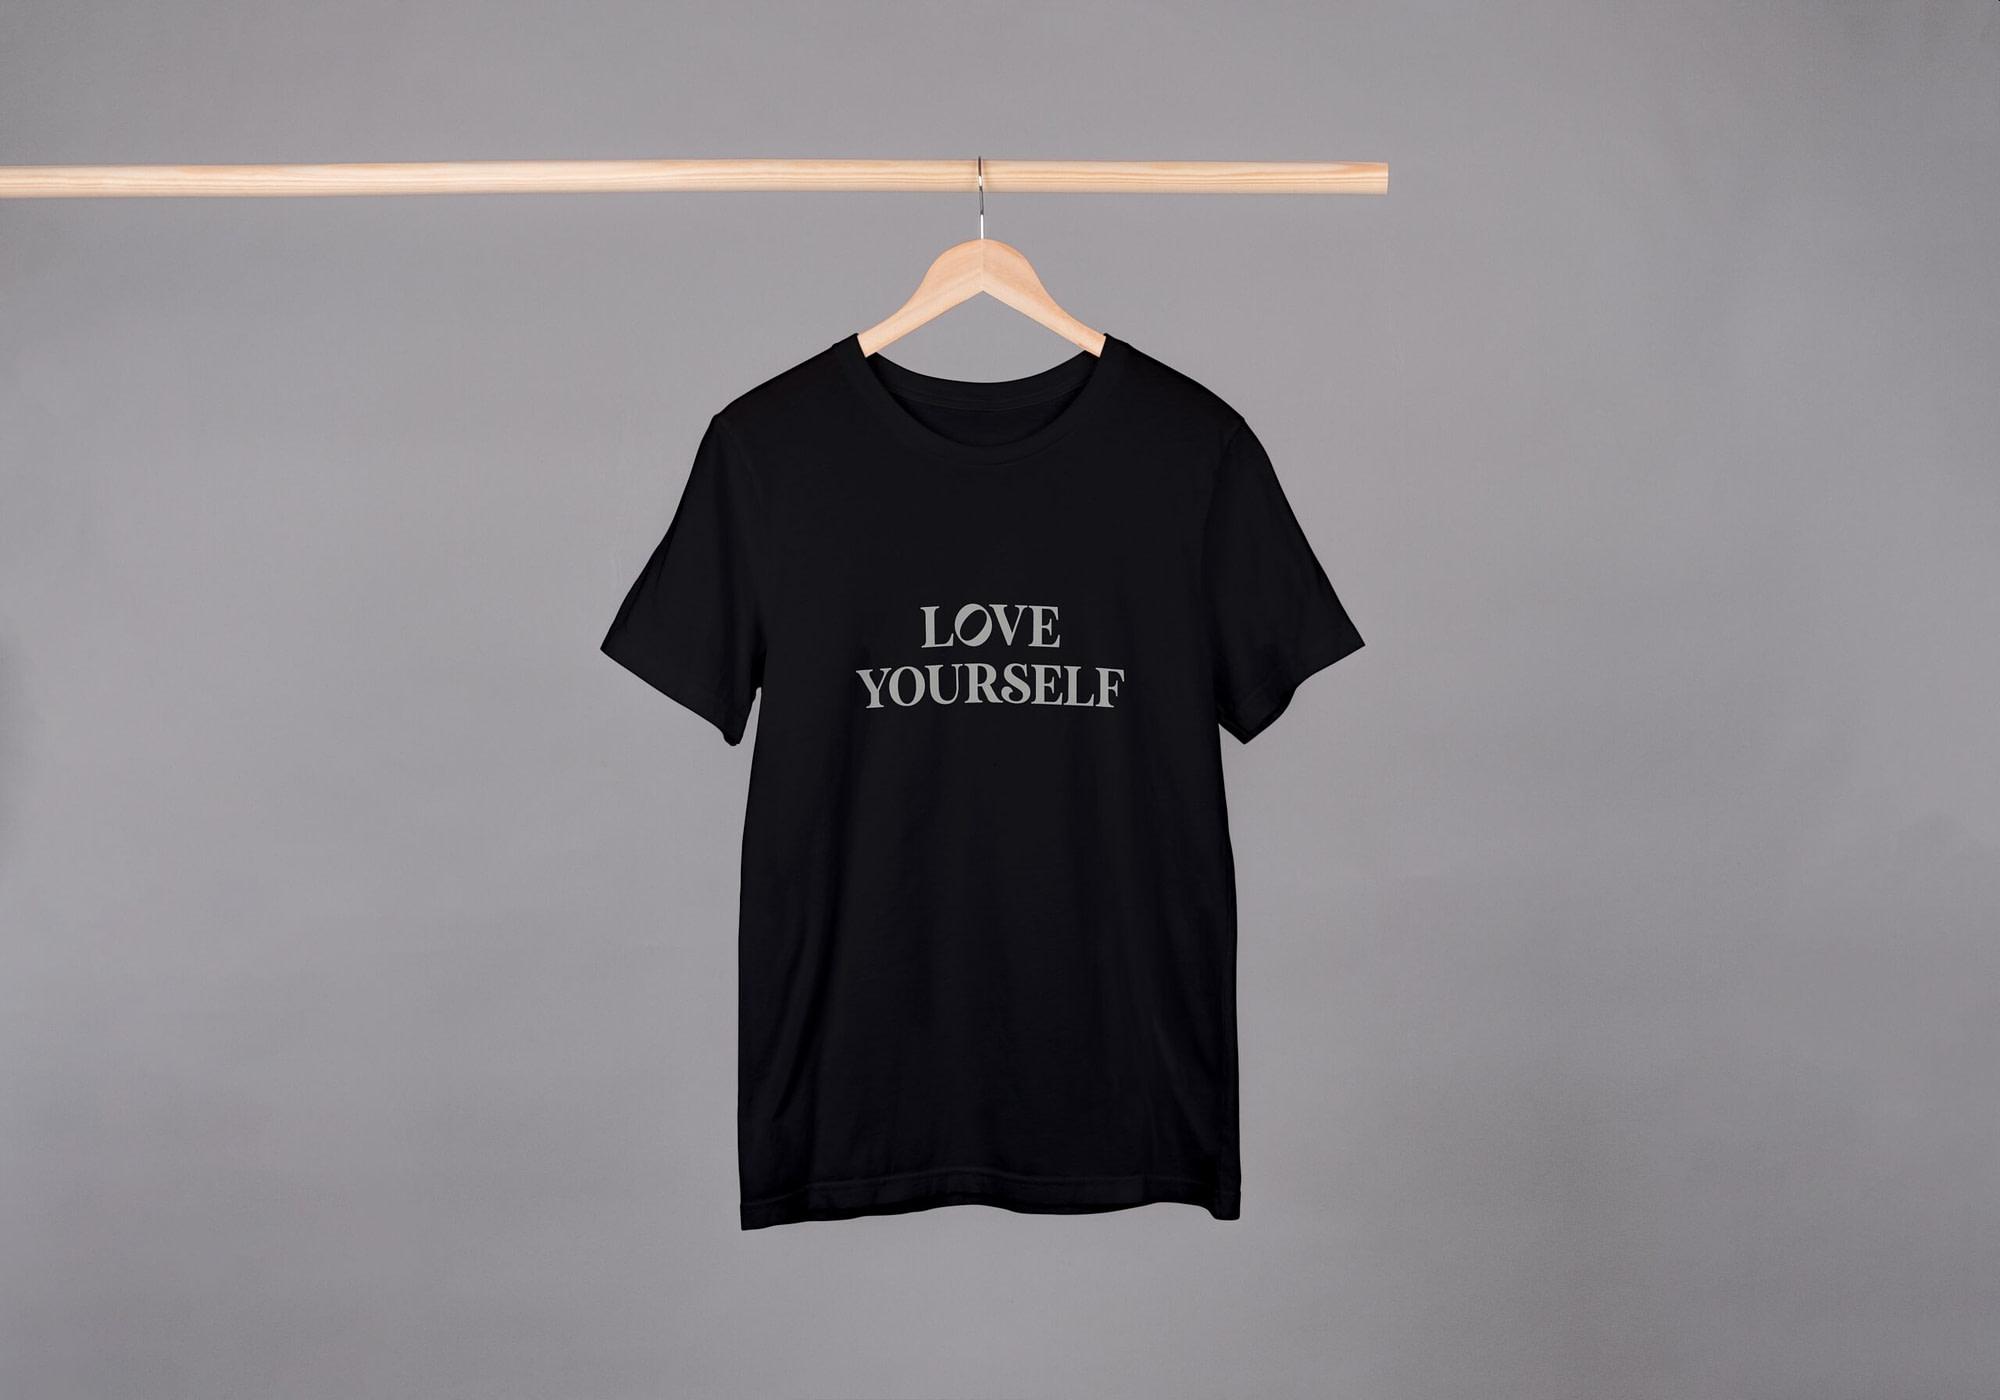 Love yourself / T-shirt